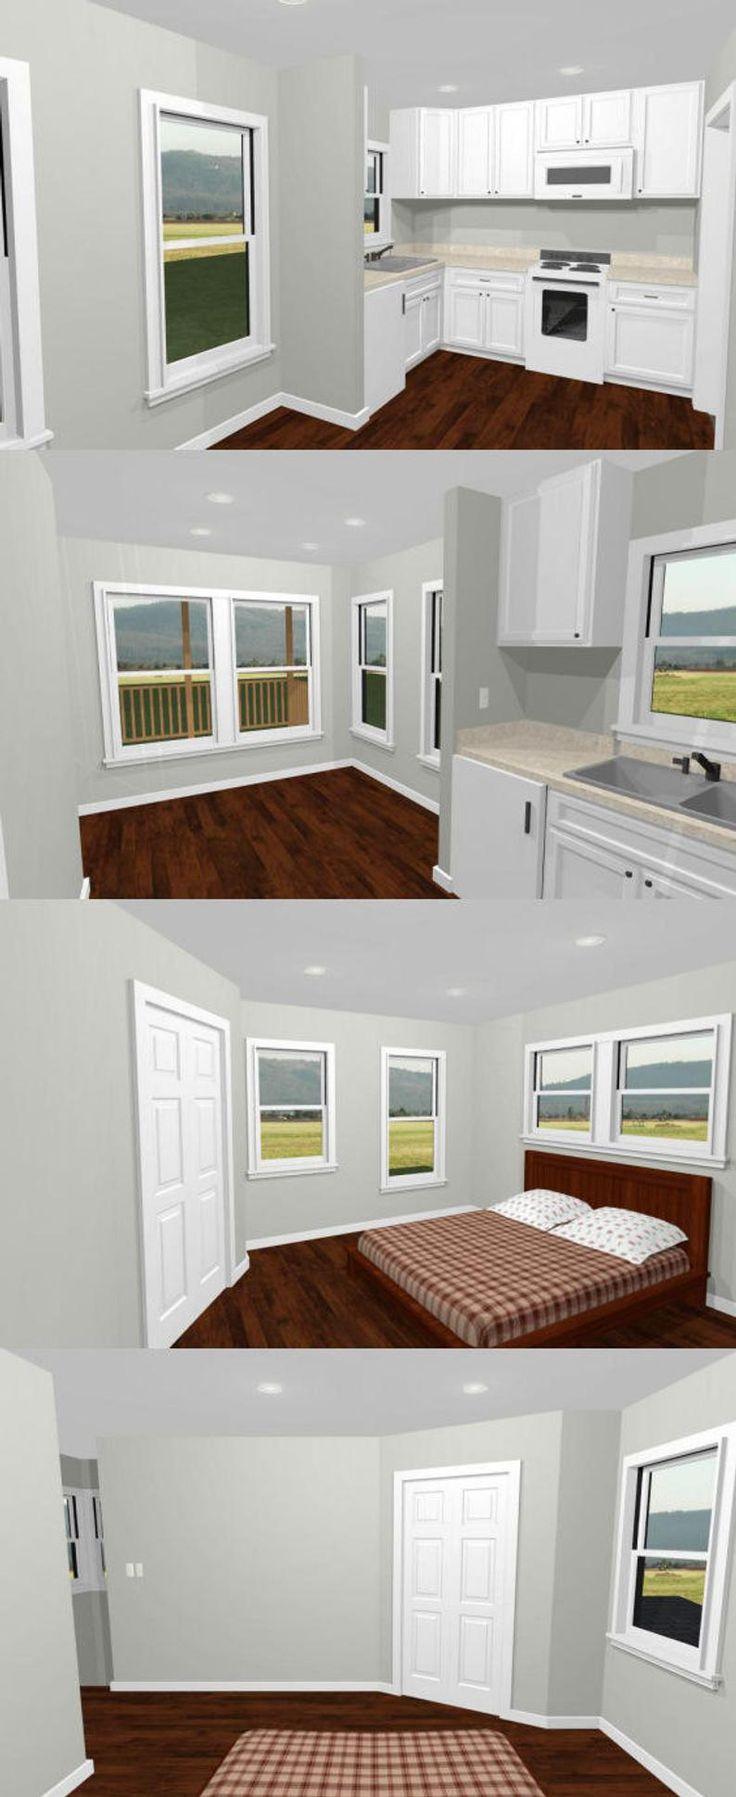 16x16 House 1Bedroom 1.5Bath 478 sq ft PDF